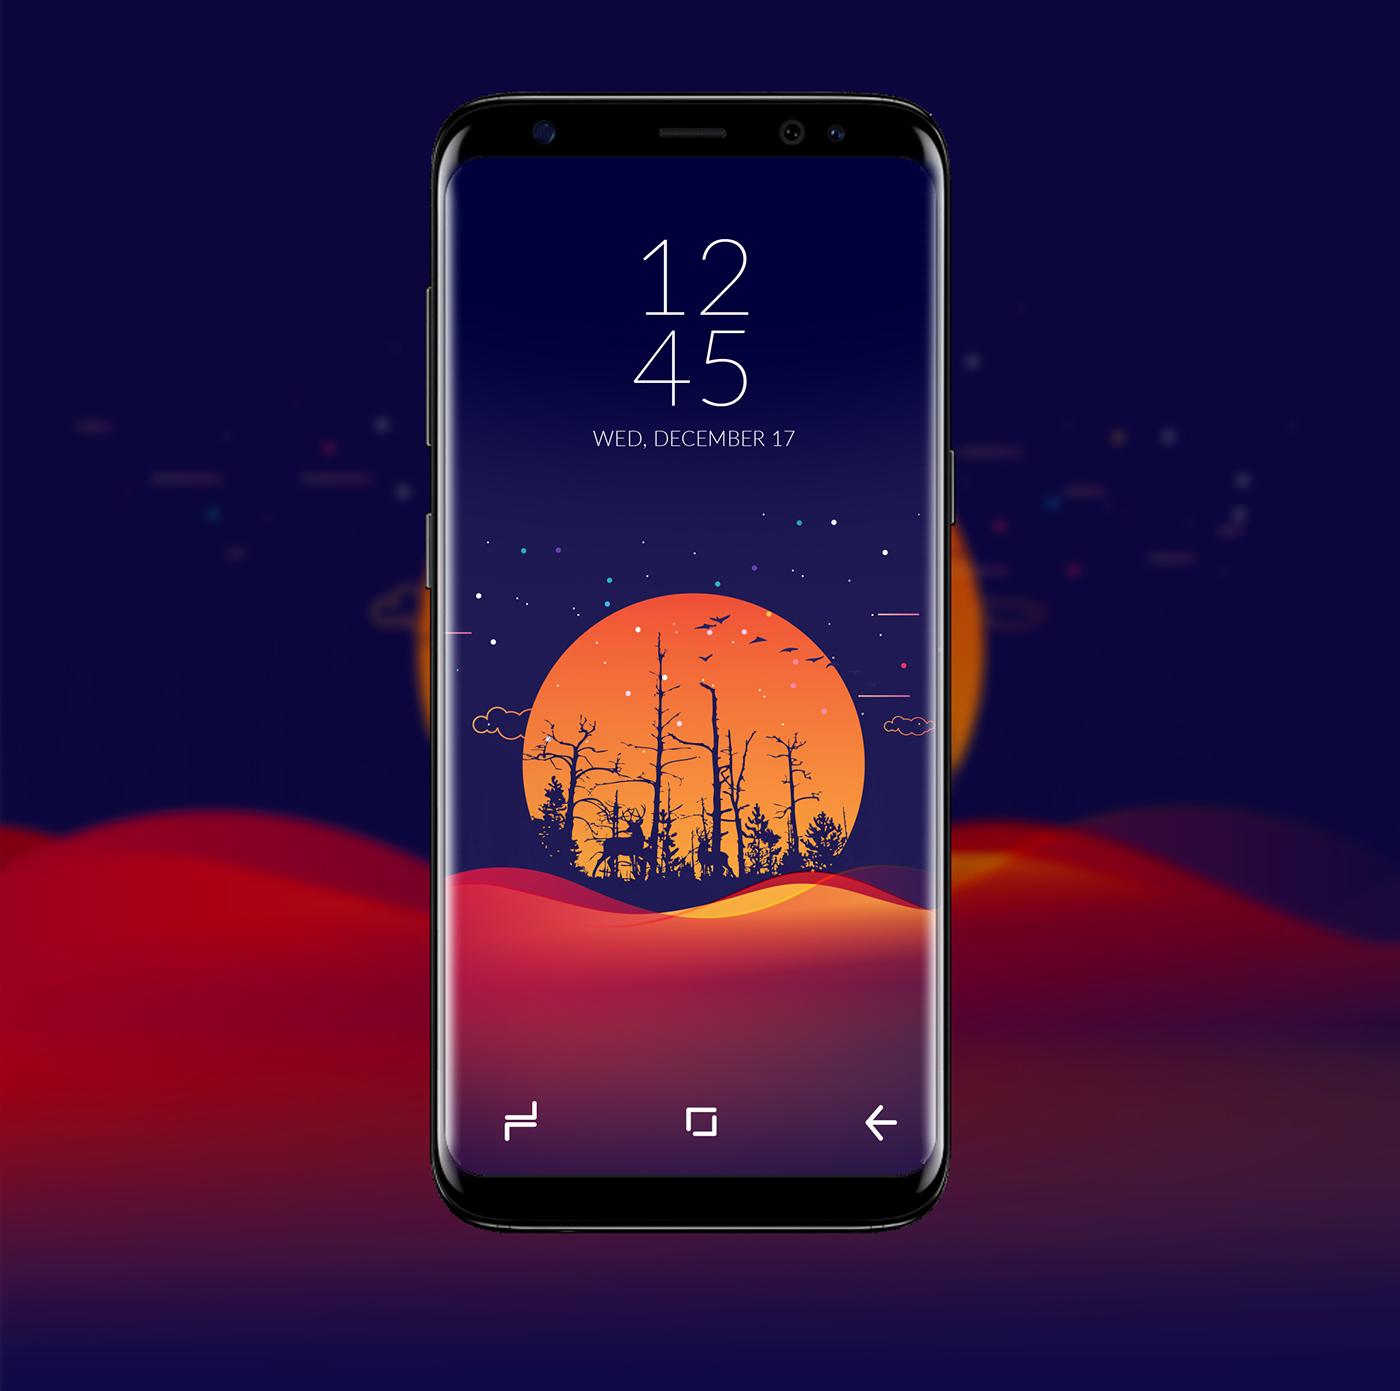 Samsung Galaxy S8 Theme Wallpaper On Behance